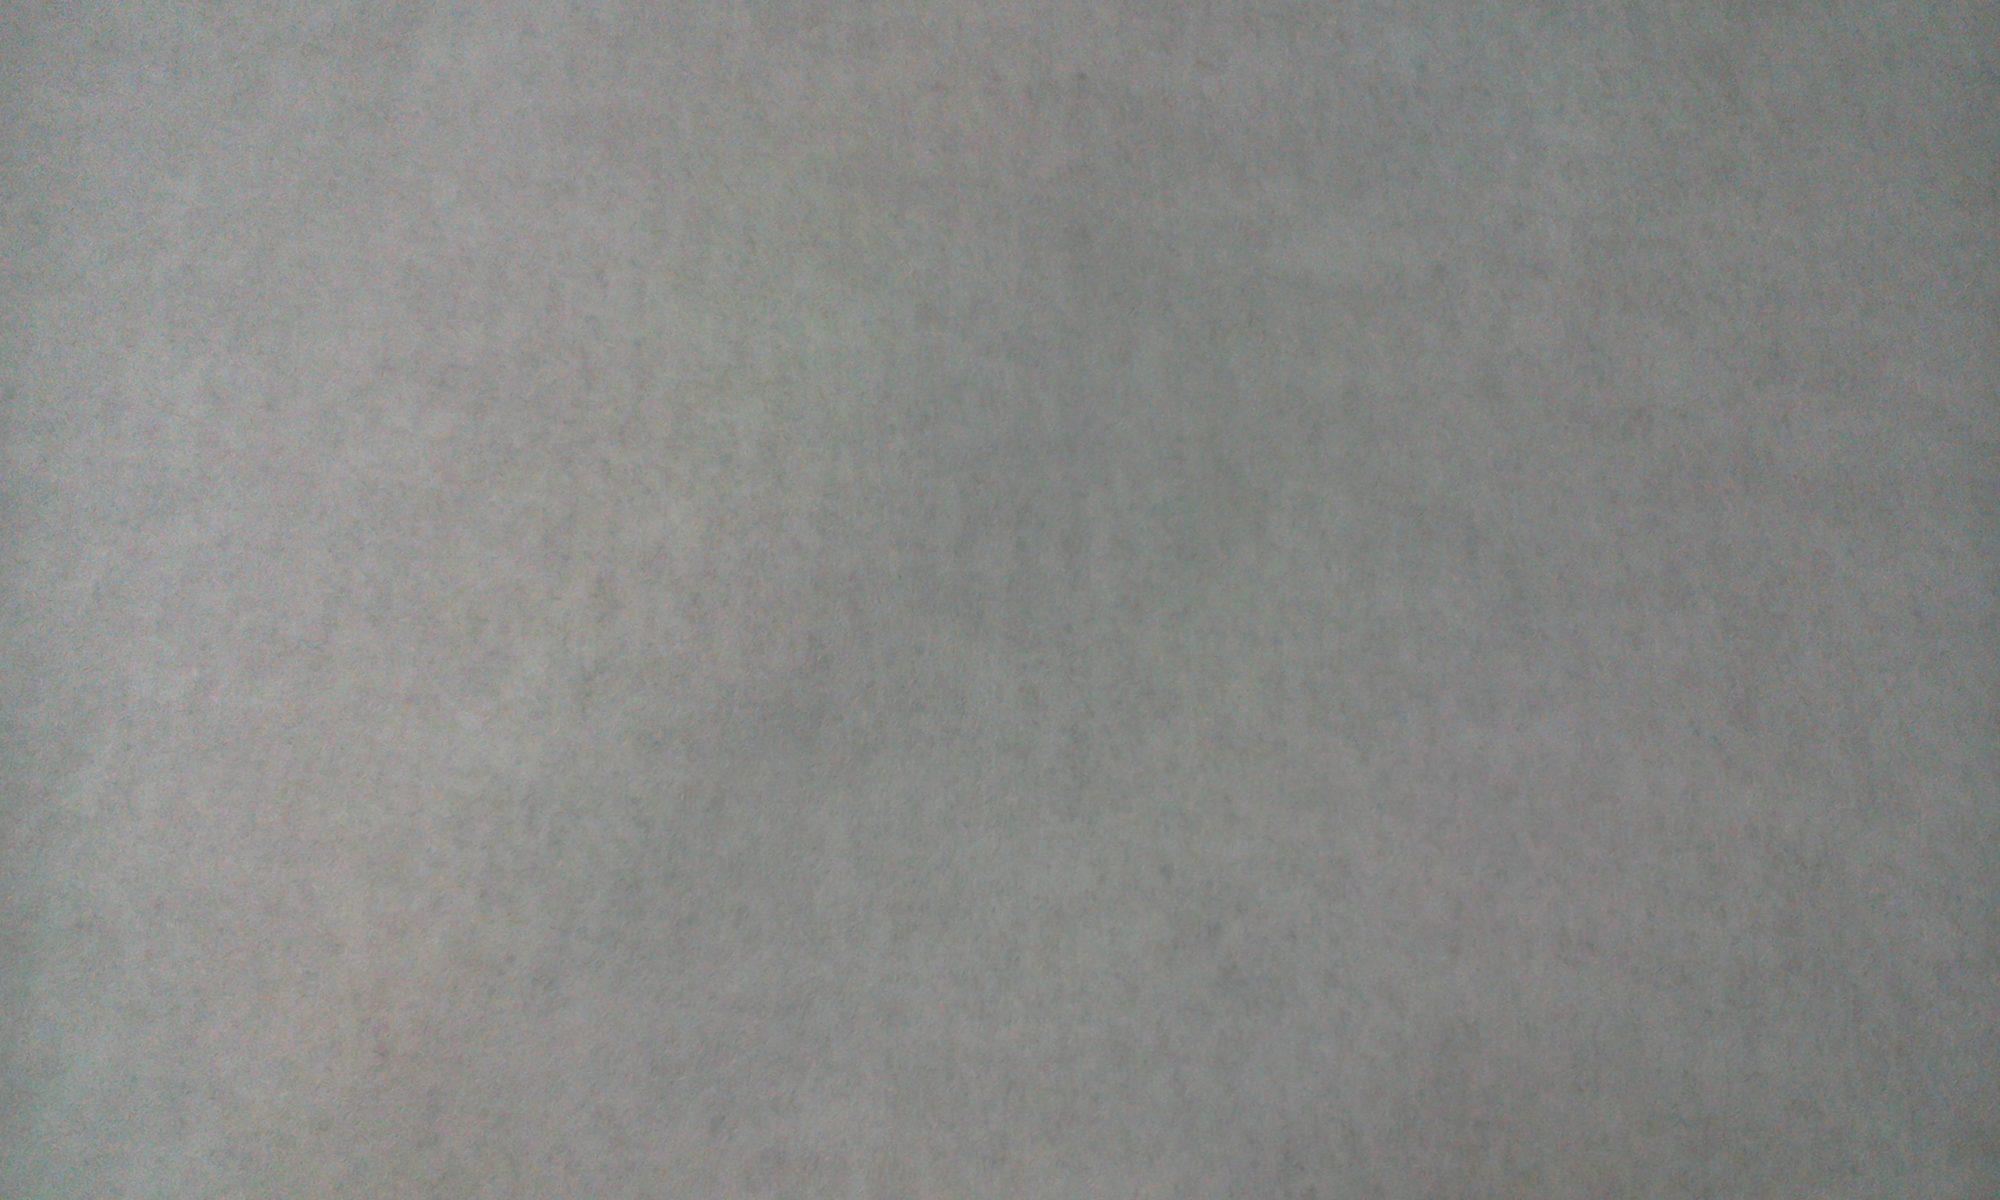 کاغذ سولفات